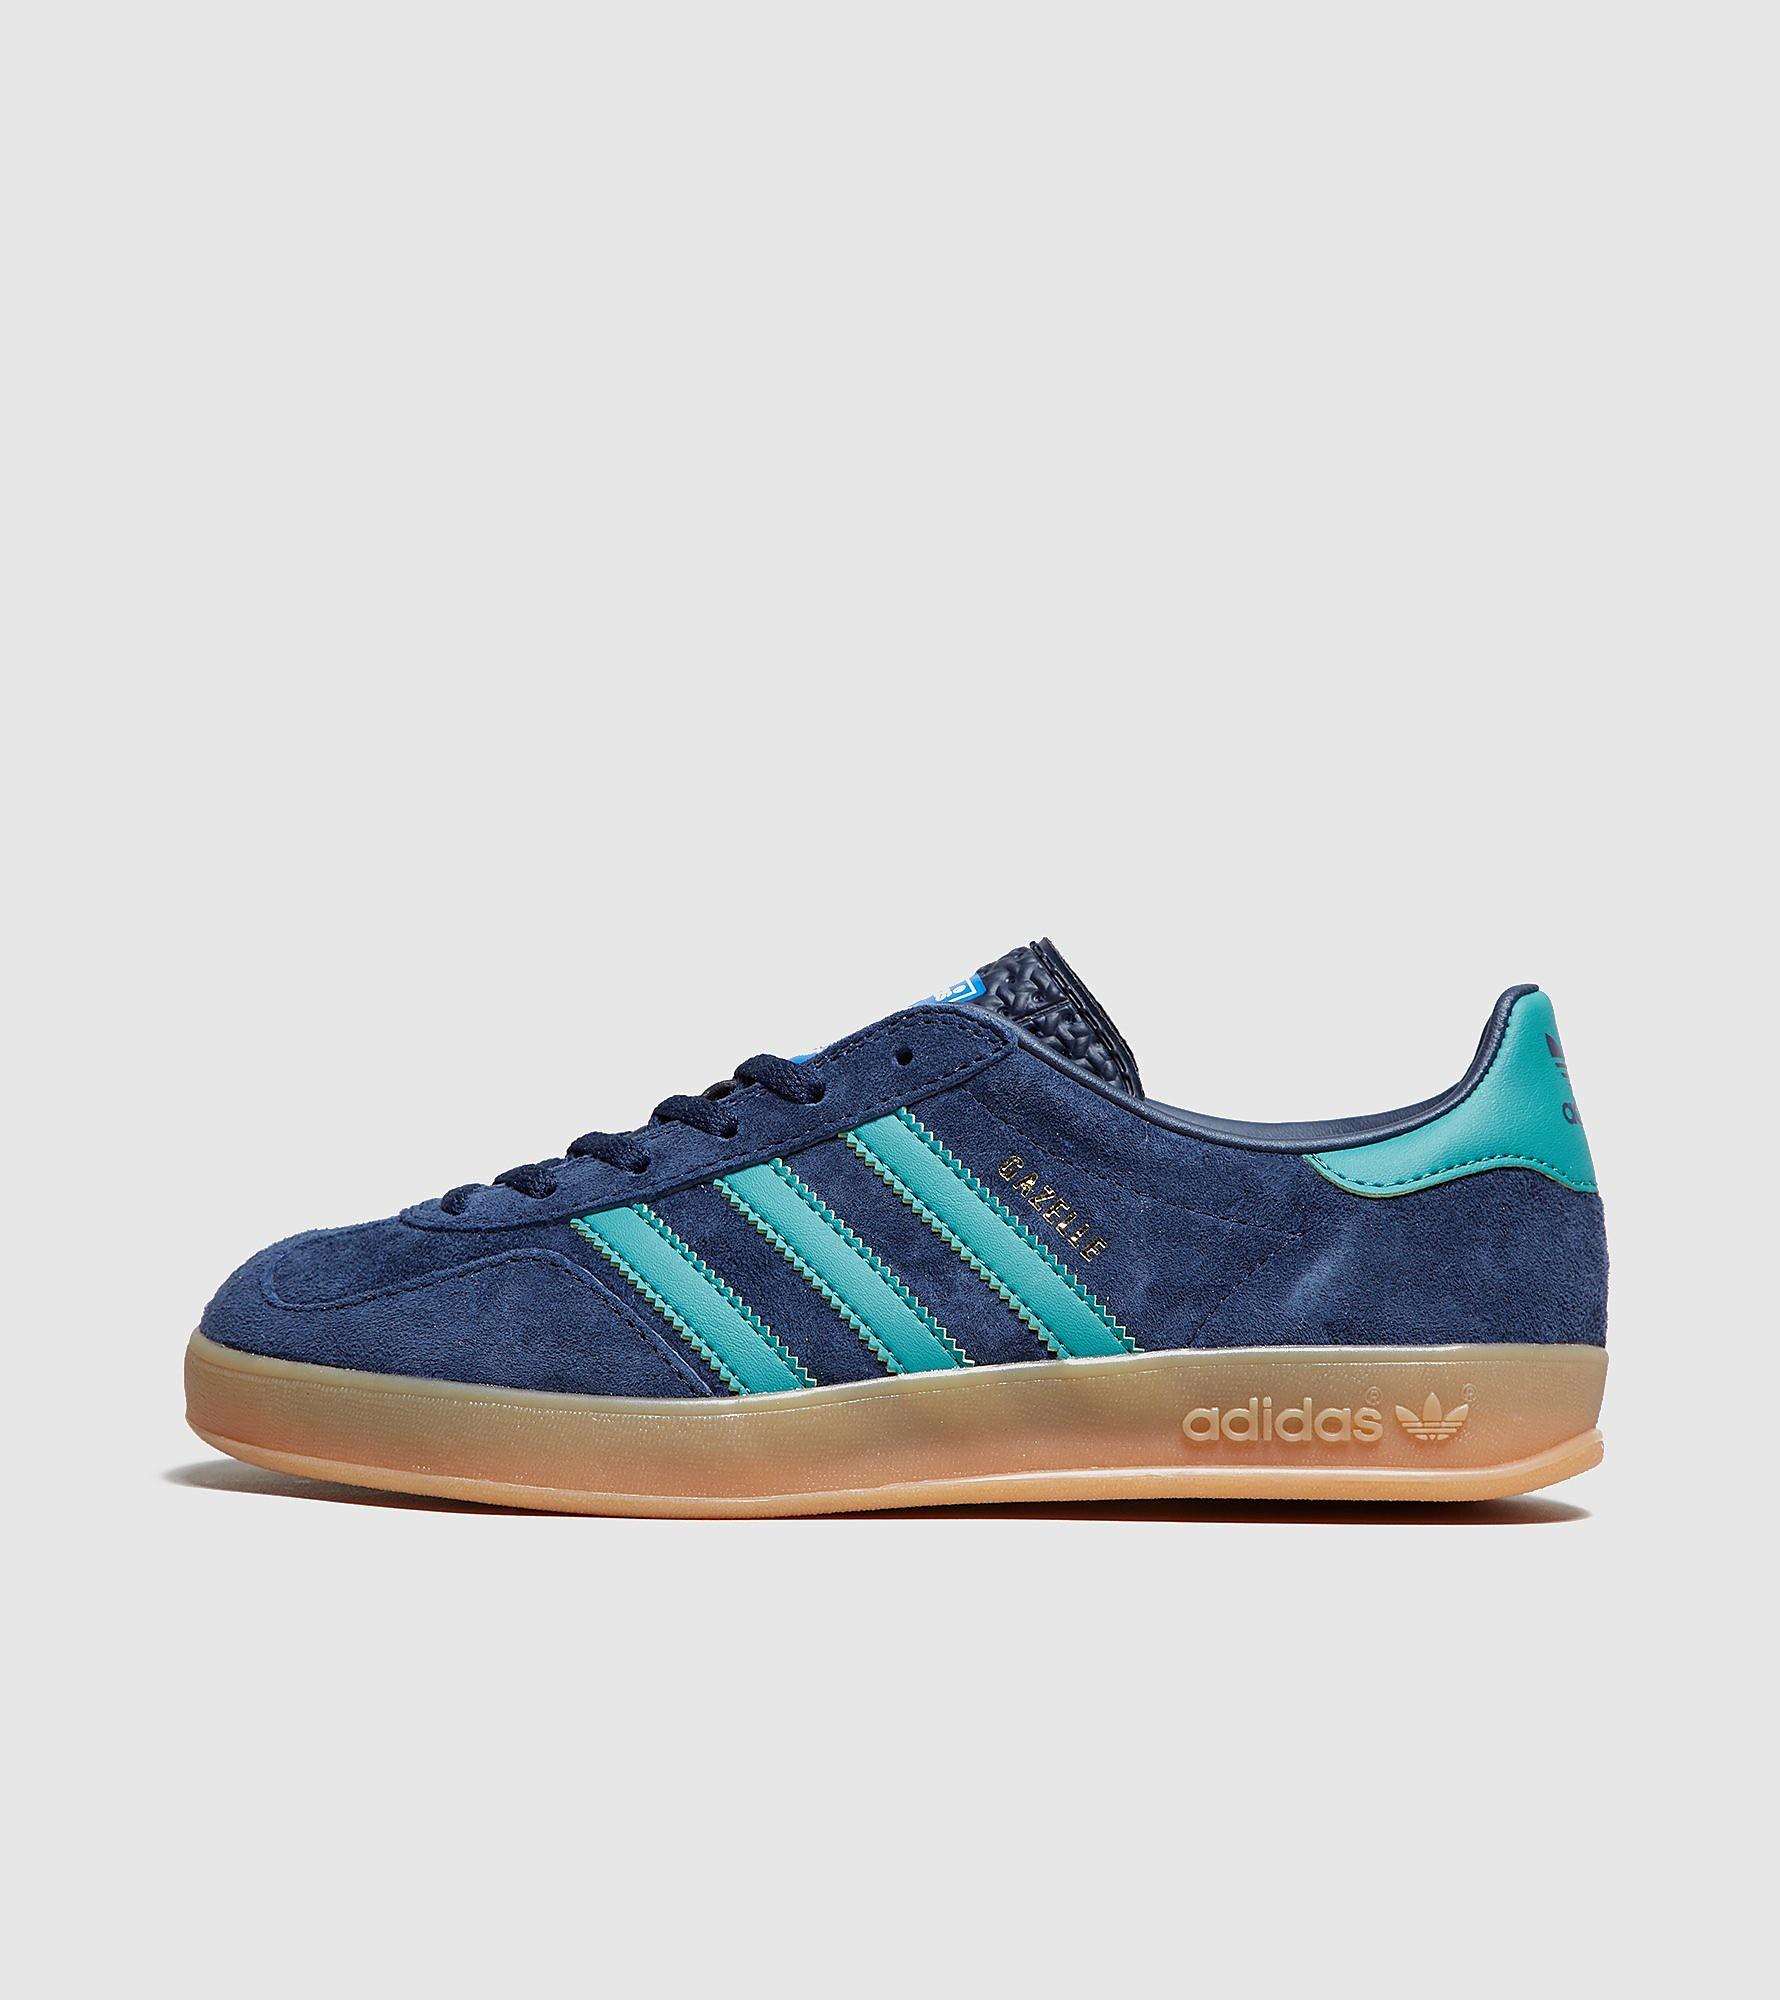 adidas Originals Gazelle Indoor Femme, Bleu